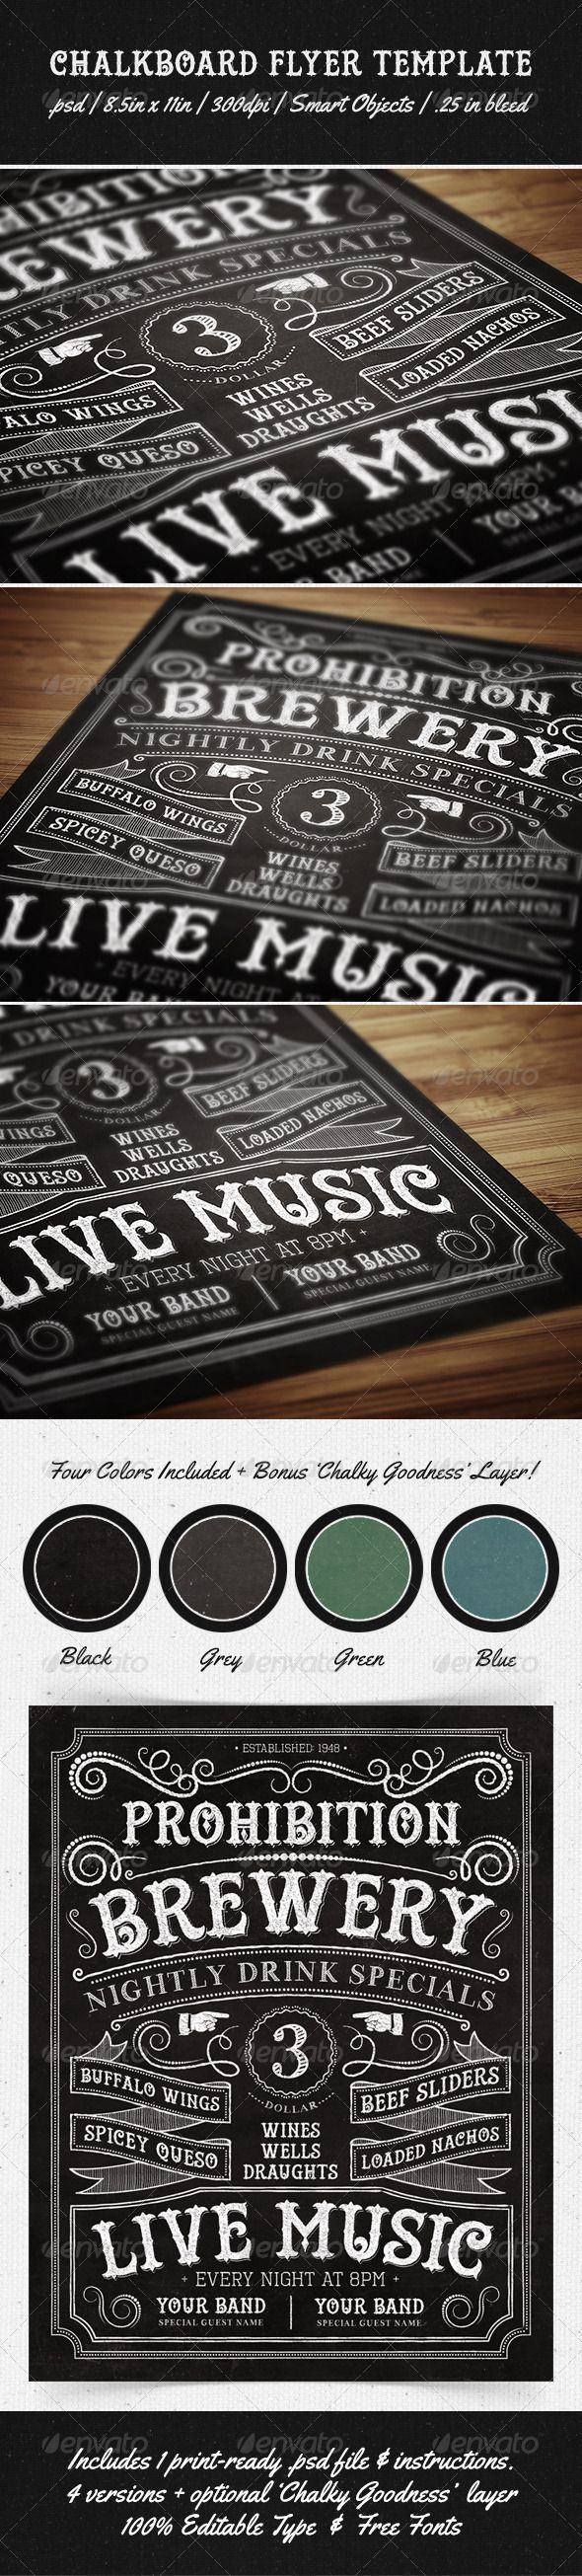 Chalkboard Flyer PSD Print Template | Download: http://graphicriver.net/item/chalkboard-flyer-template/5405878?WT.ac=category_thumbWT.z_author=MakeMediaCoref=ksioks